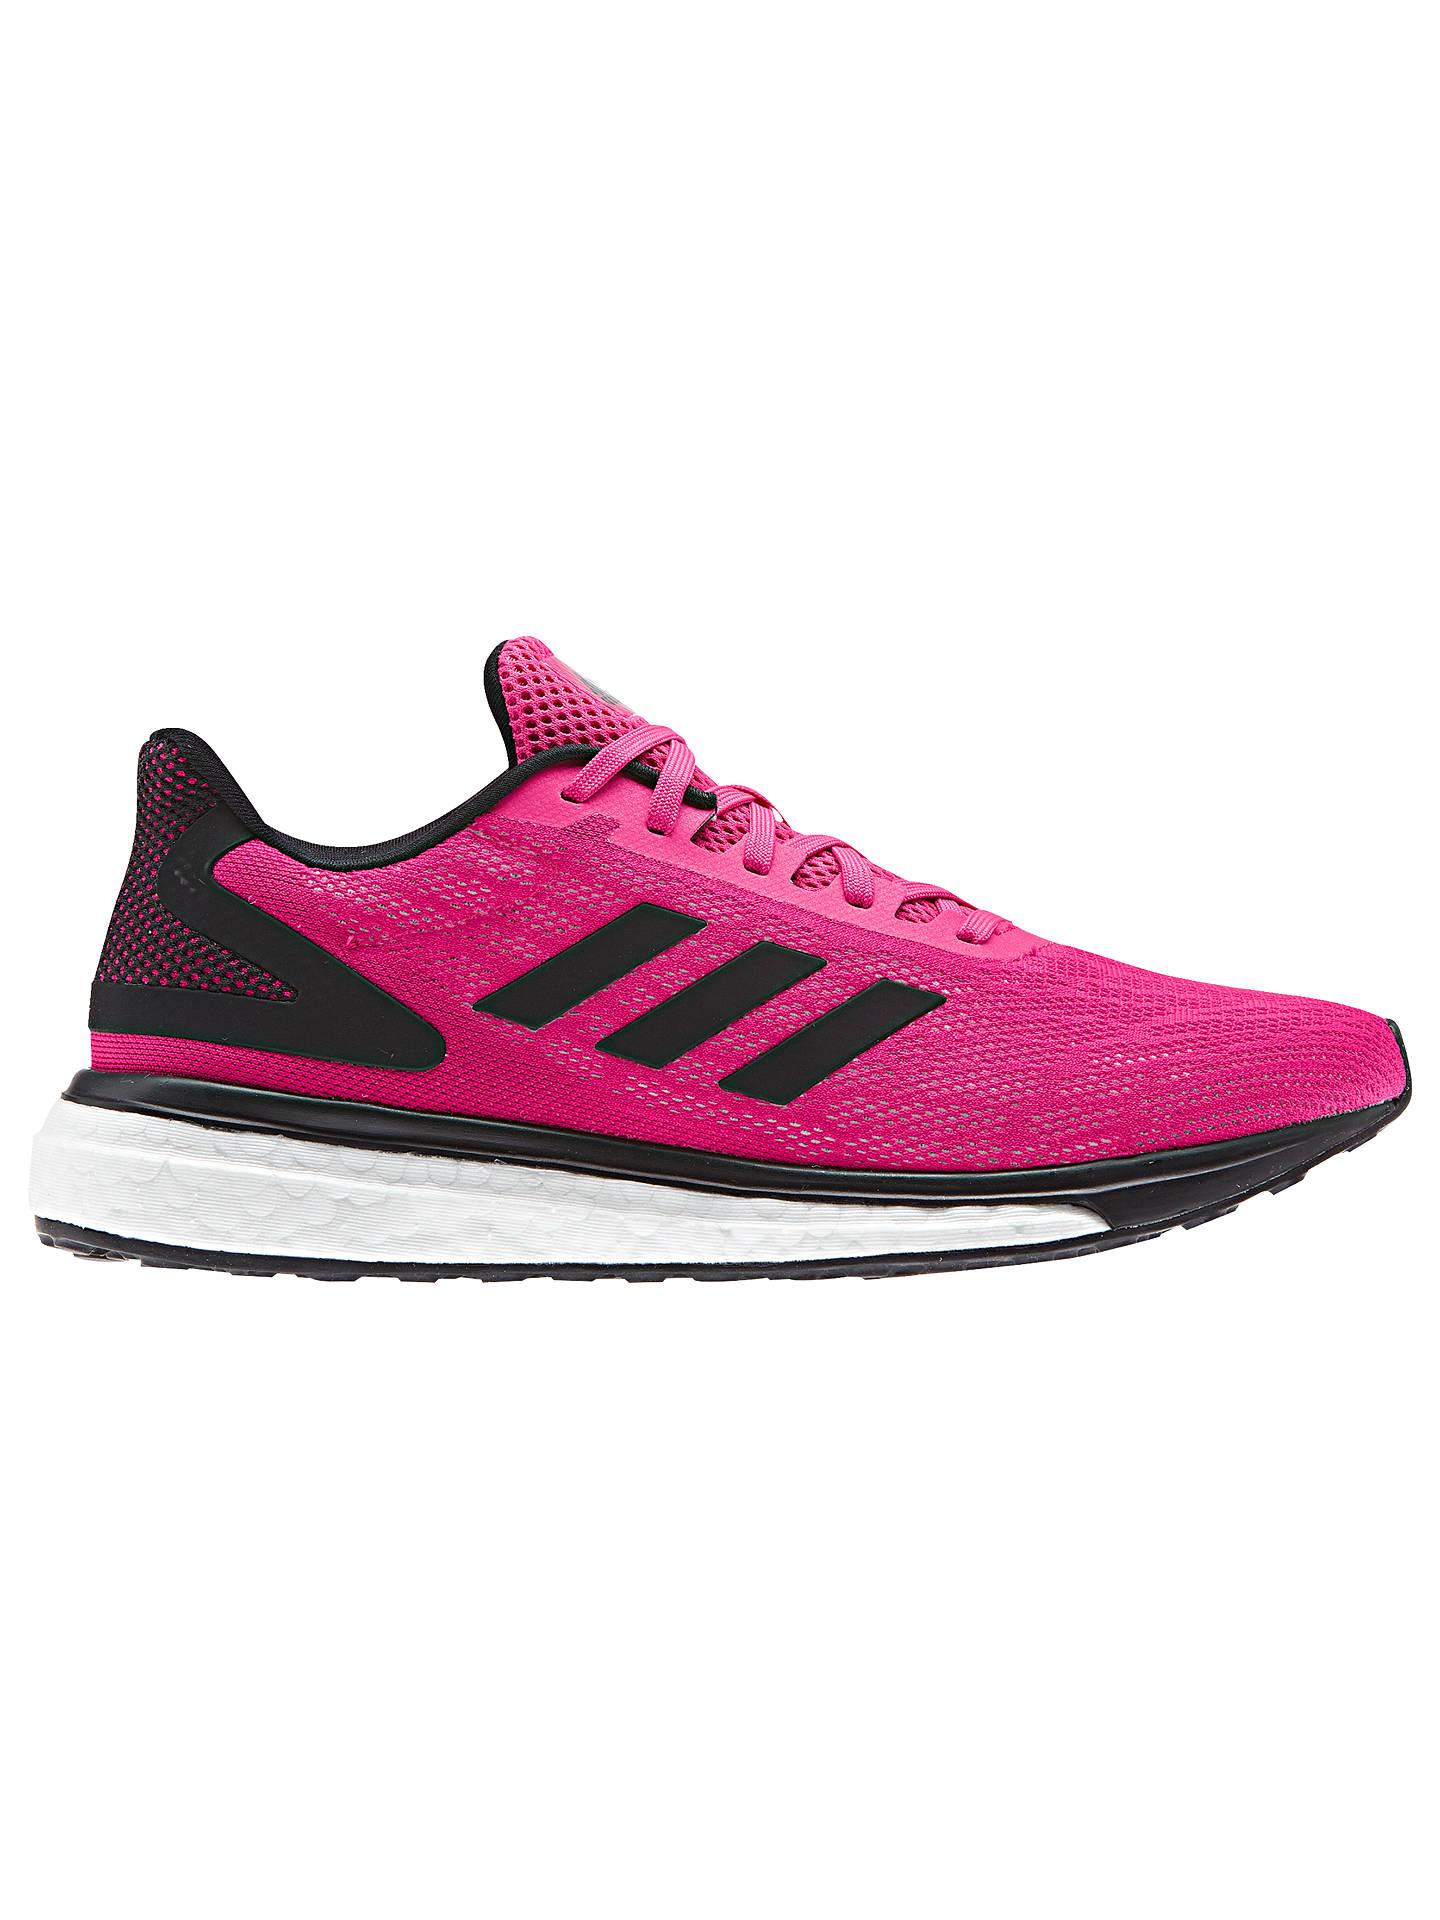 adidas response boost violet